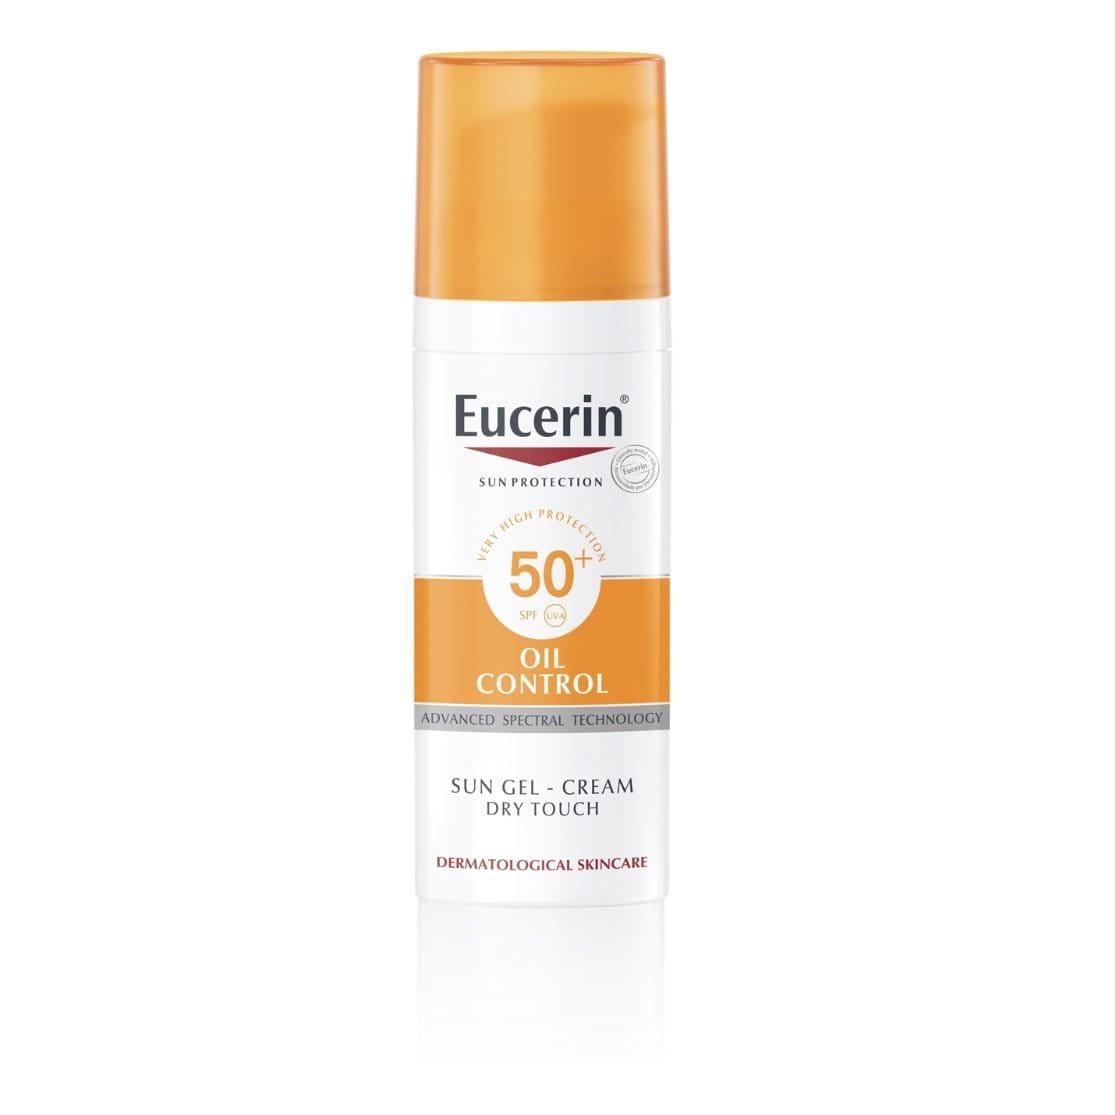 Eucerin Sun Face Oil Control Dry Touch SPF 50+